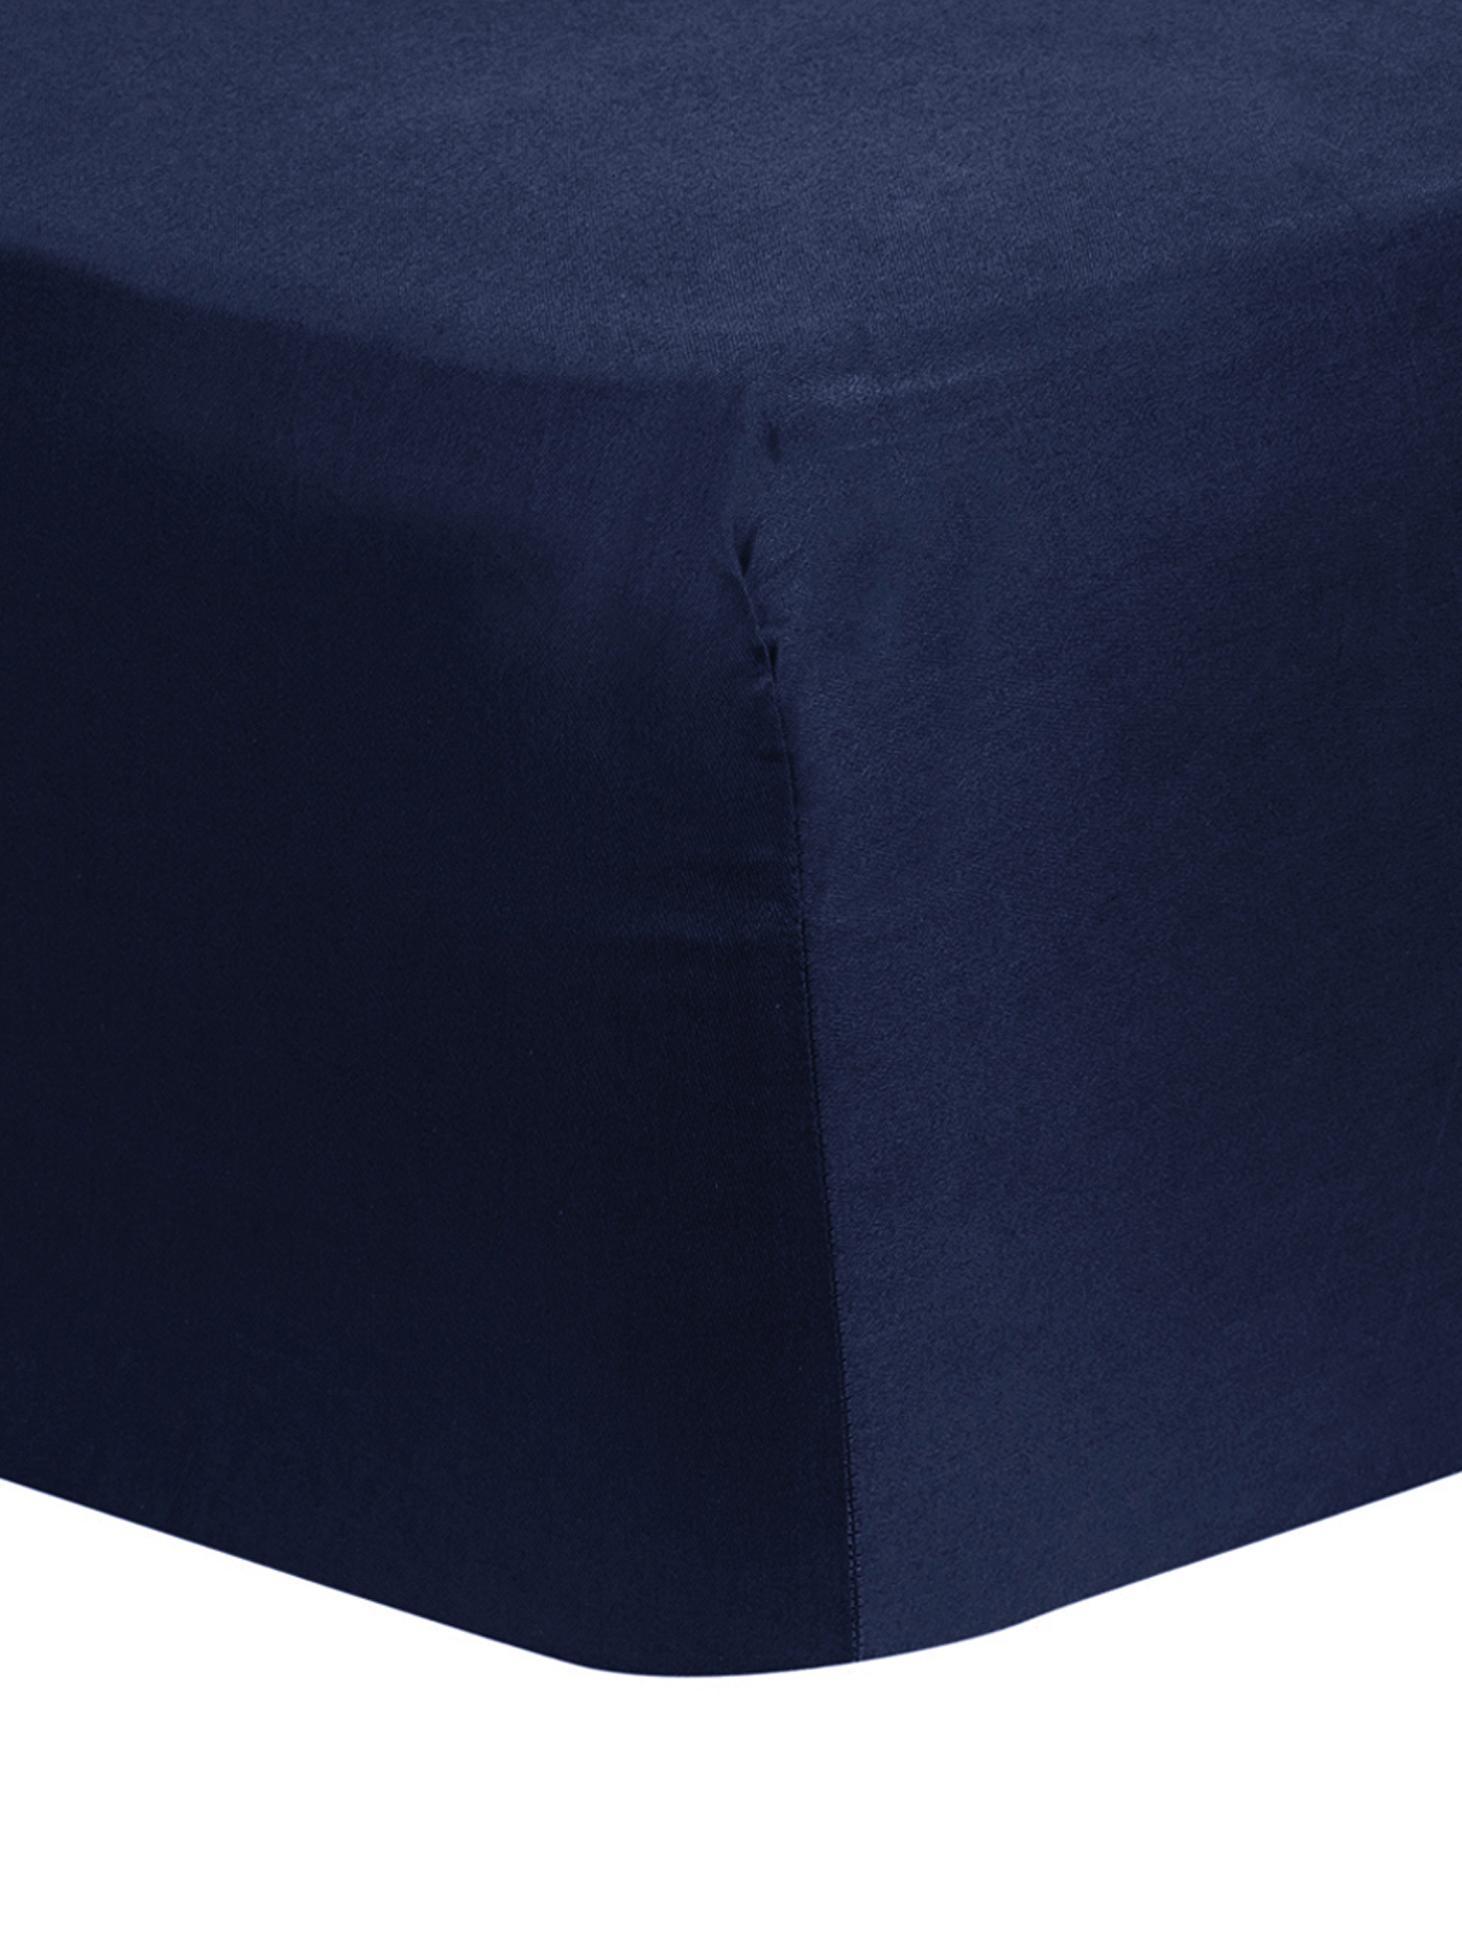 Sábana bajera para boxspring de algodón Comfort, Azul oscuro, Cama 135/140 cm (140 x 200 cm)